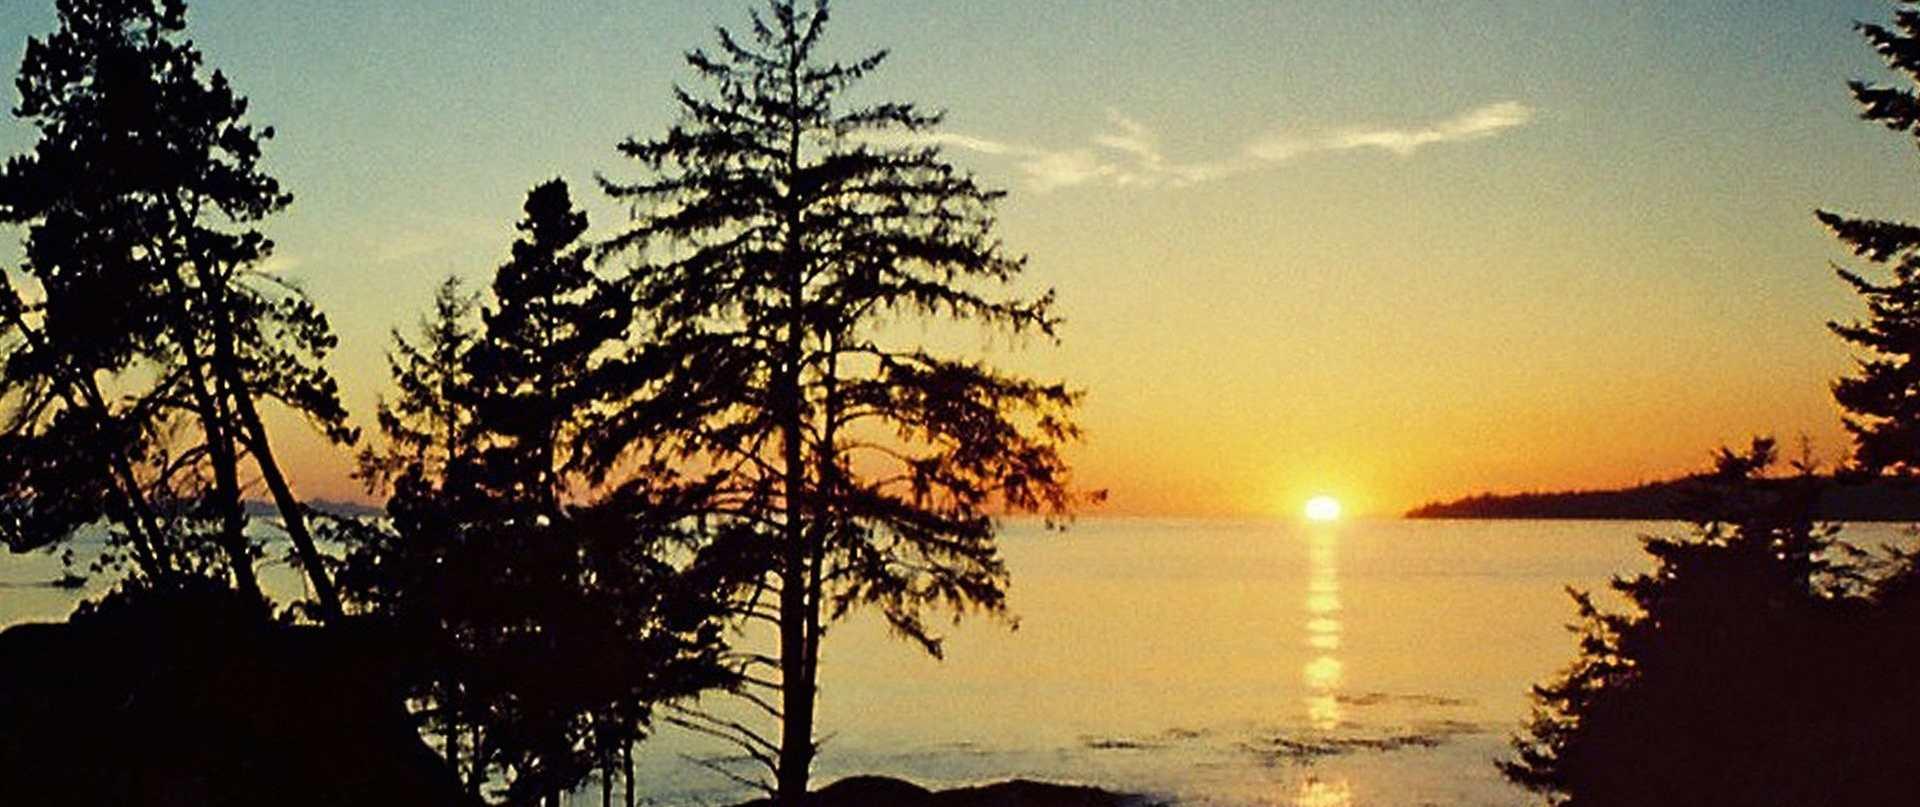 sunset-hi-res-2-2mb-copy-copy-version-2.jpg.1920x807_default.jpg